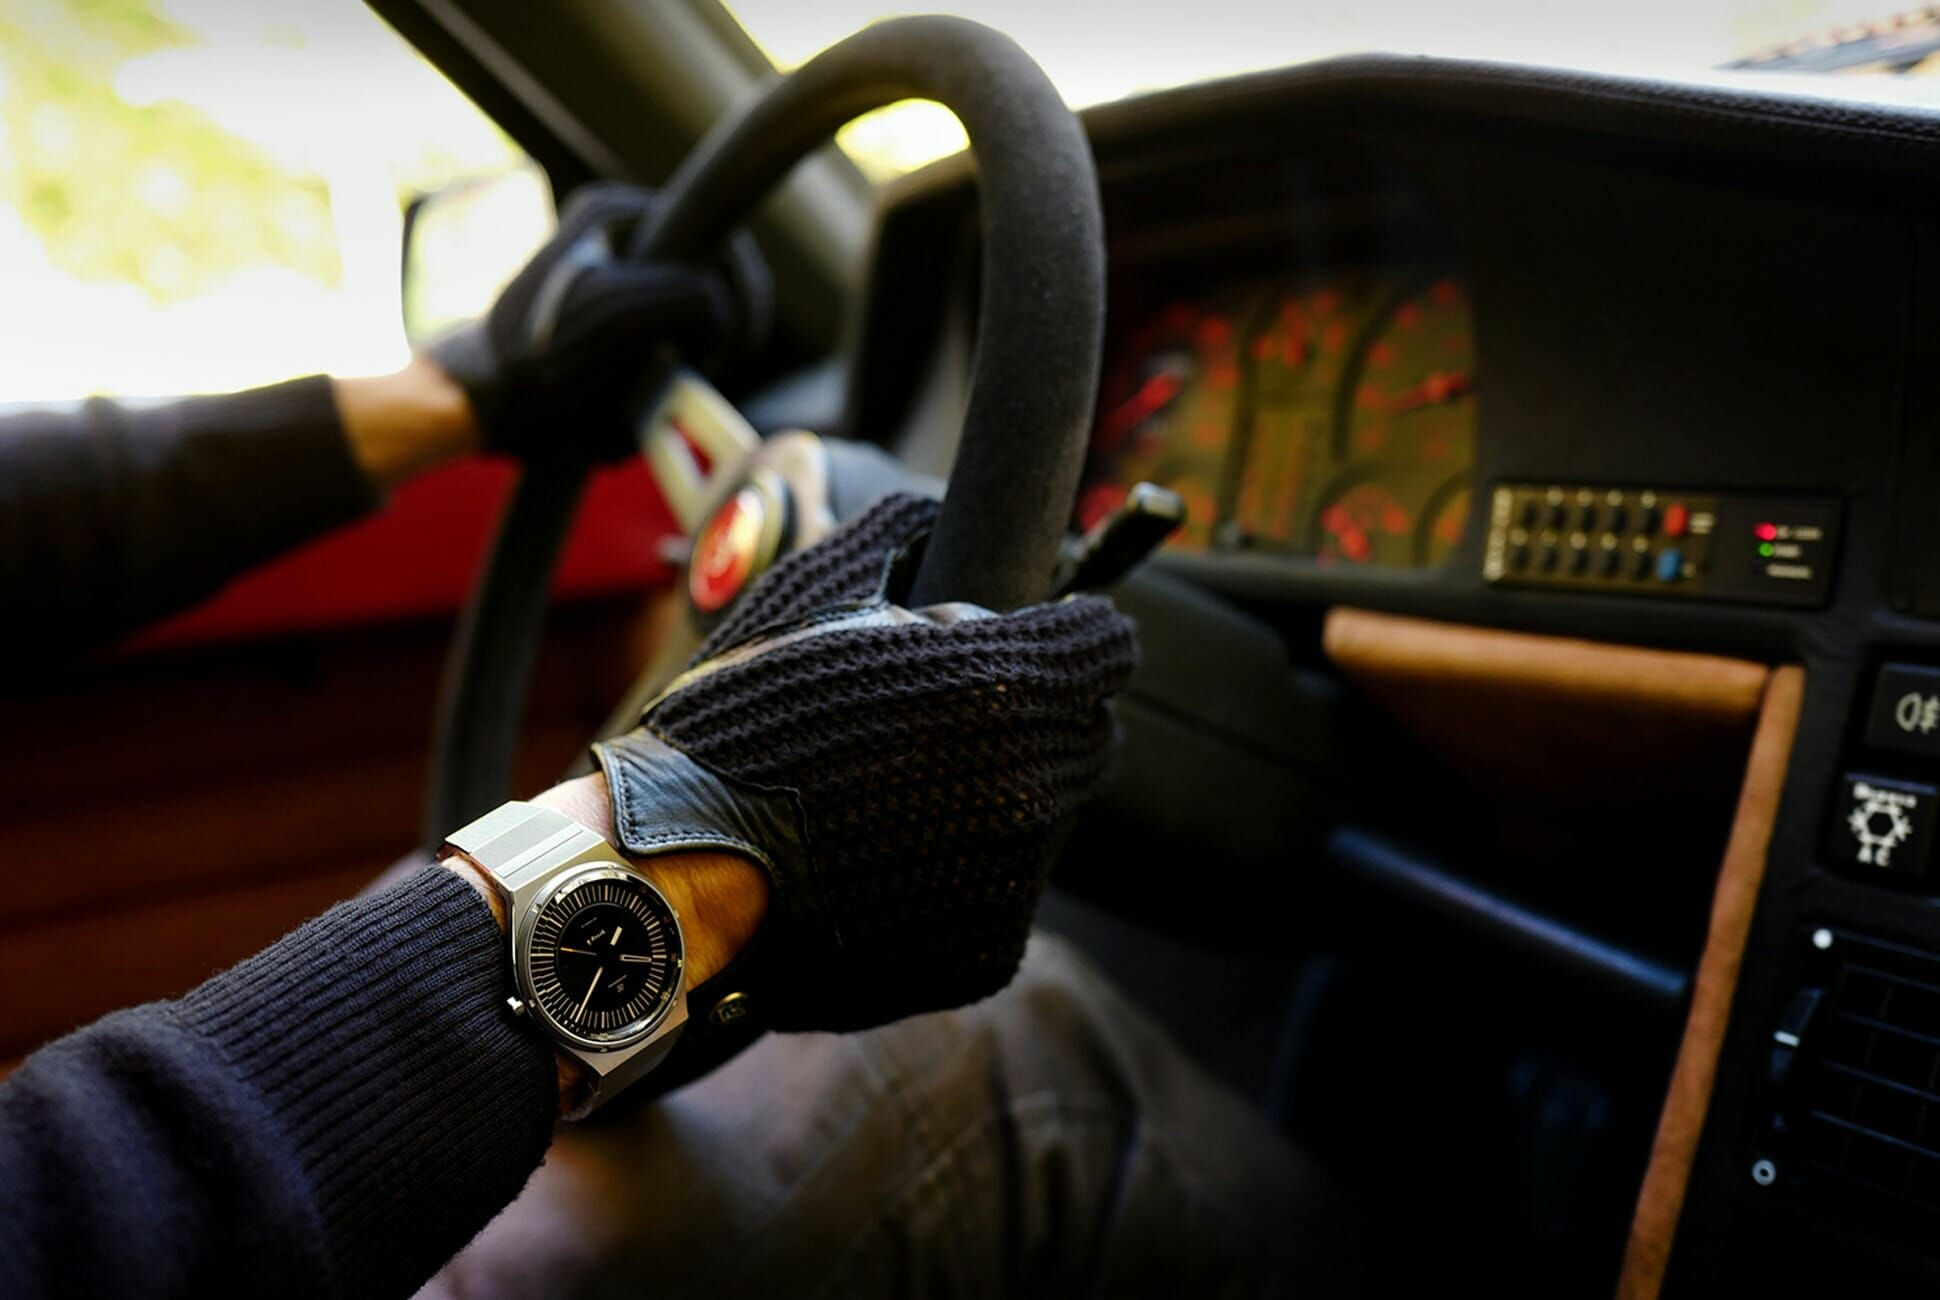 Autodromo-Group-B-Gear-Patrol-Slide-1